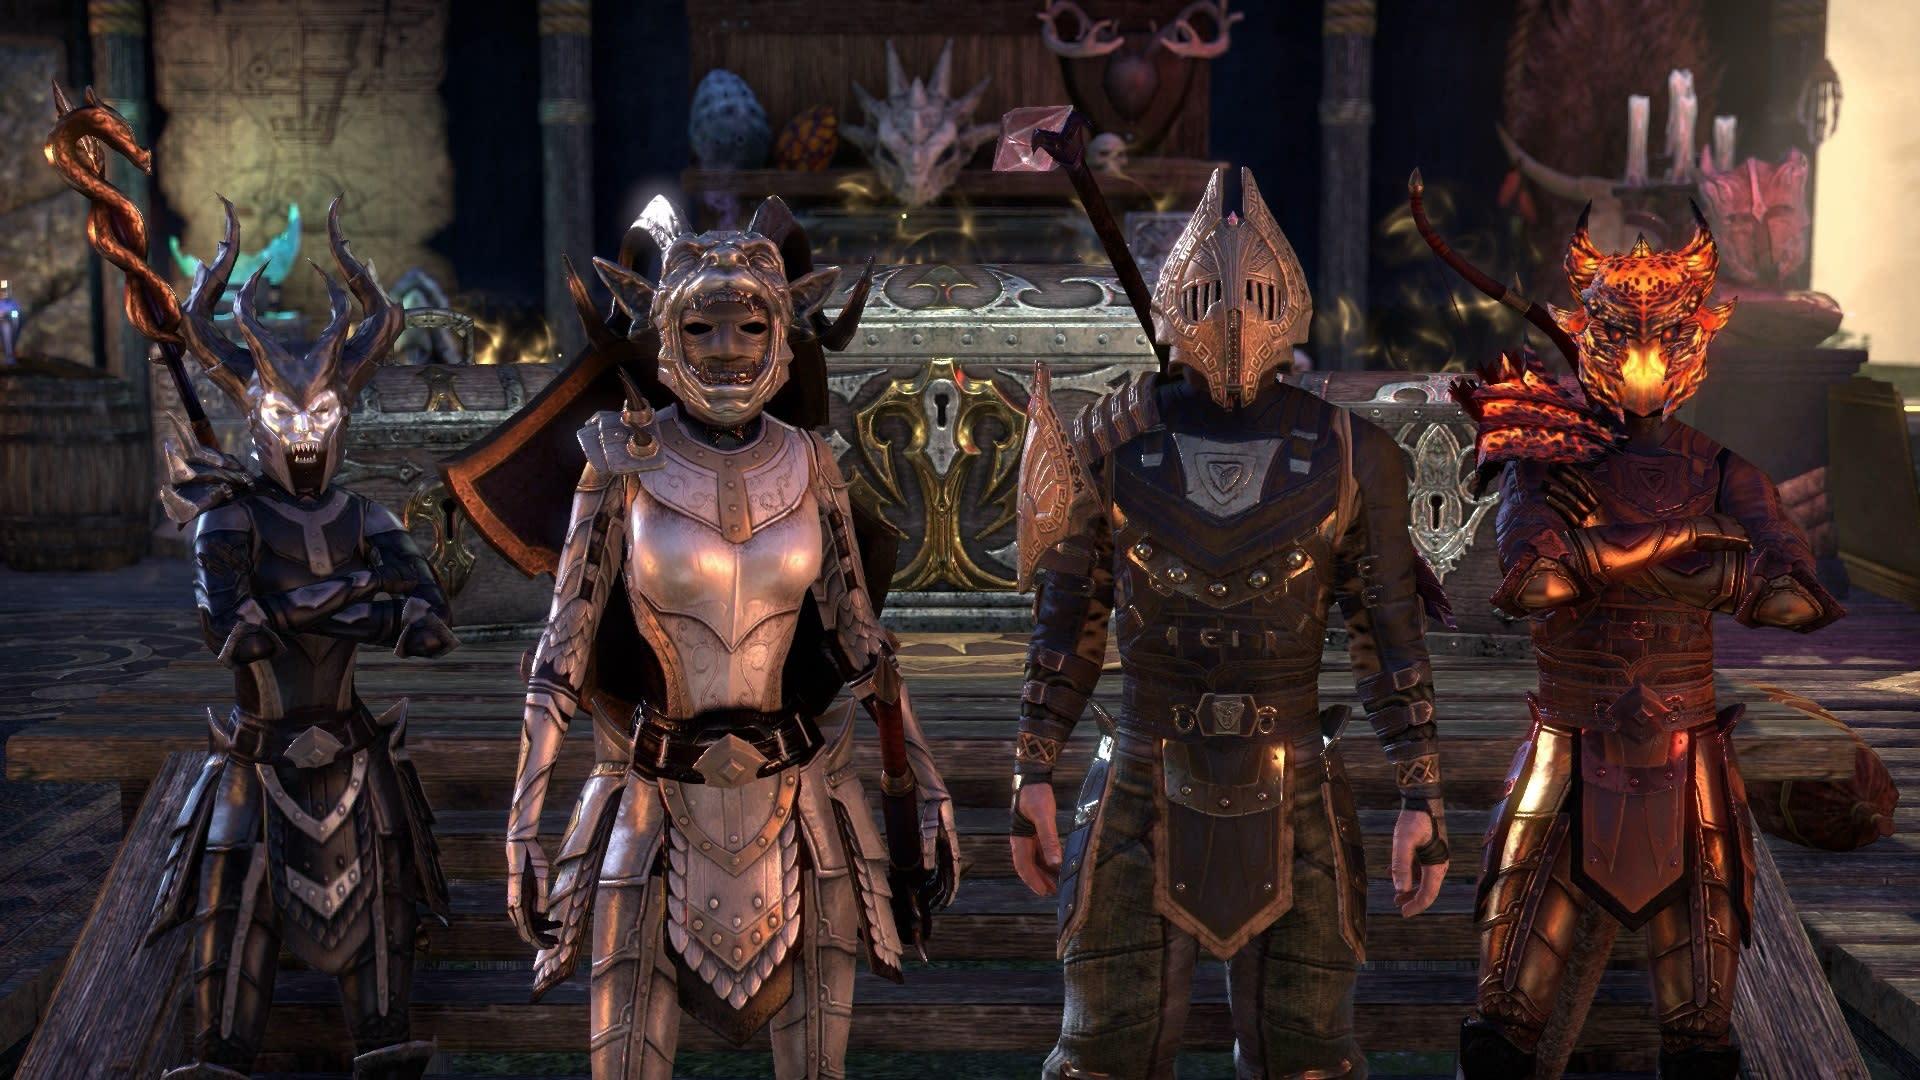 The Elder Scrolls Online's Undaunted Pledge system promotes